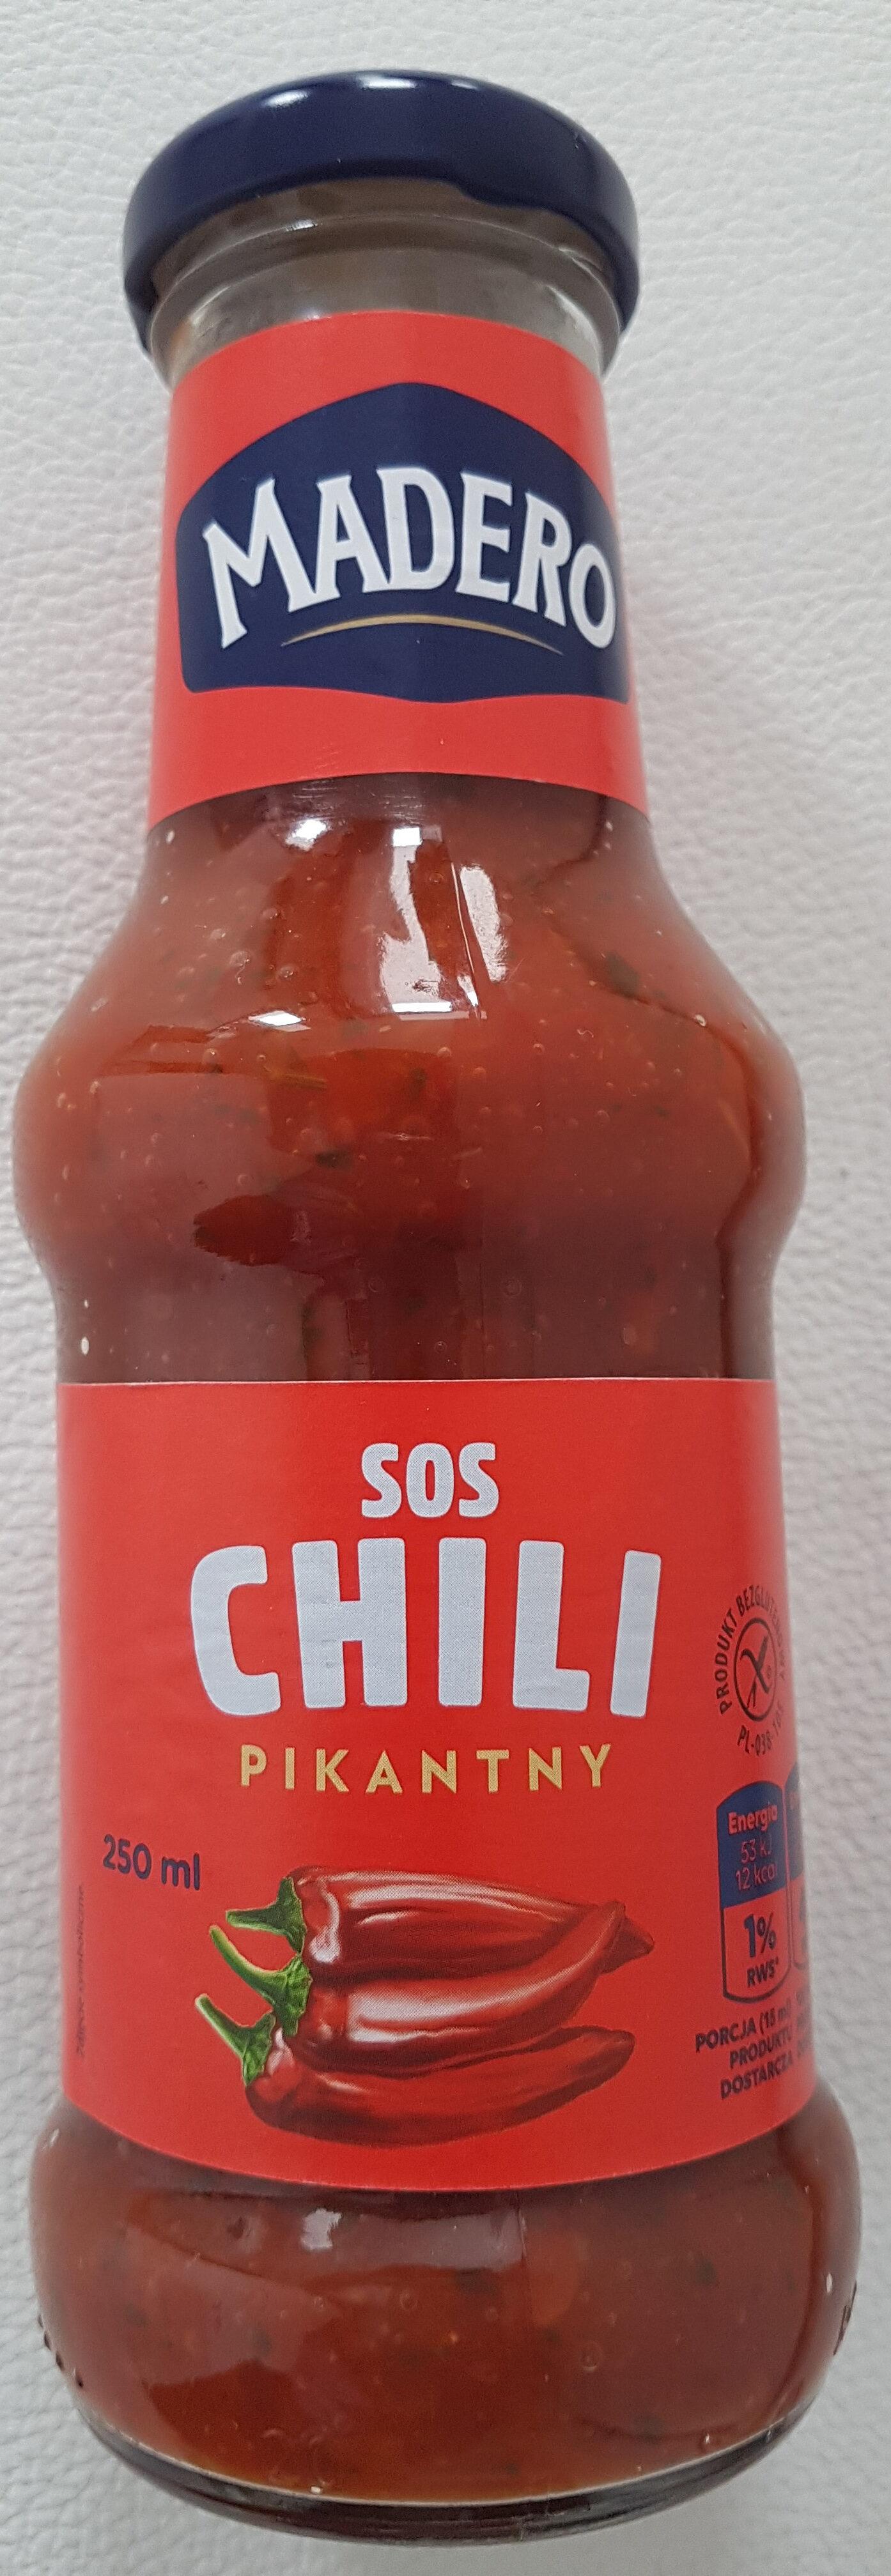 Sos chilli pikantny - Produkt - pl